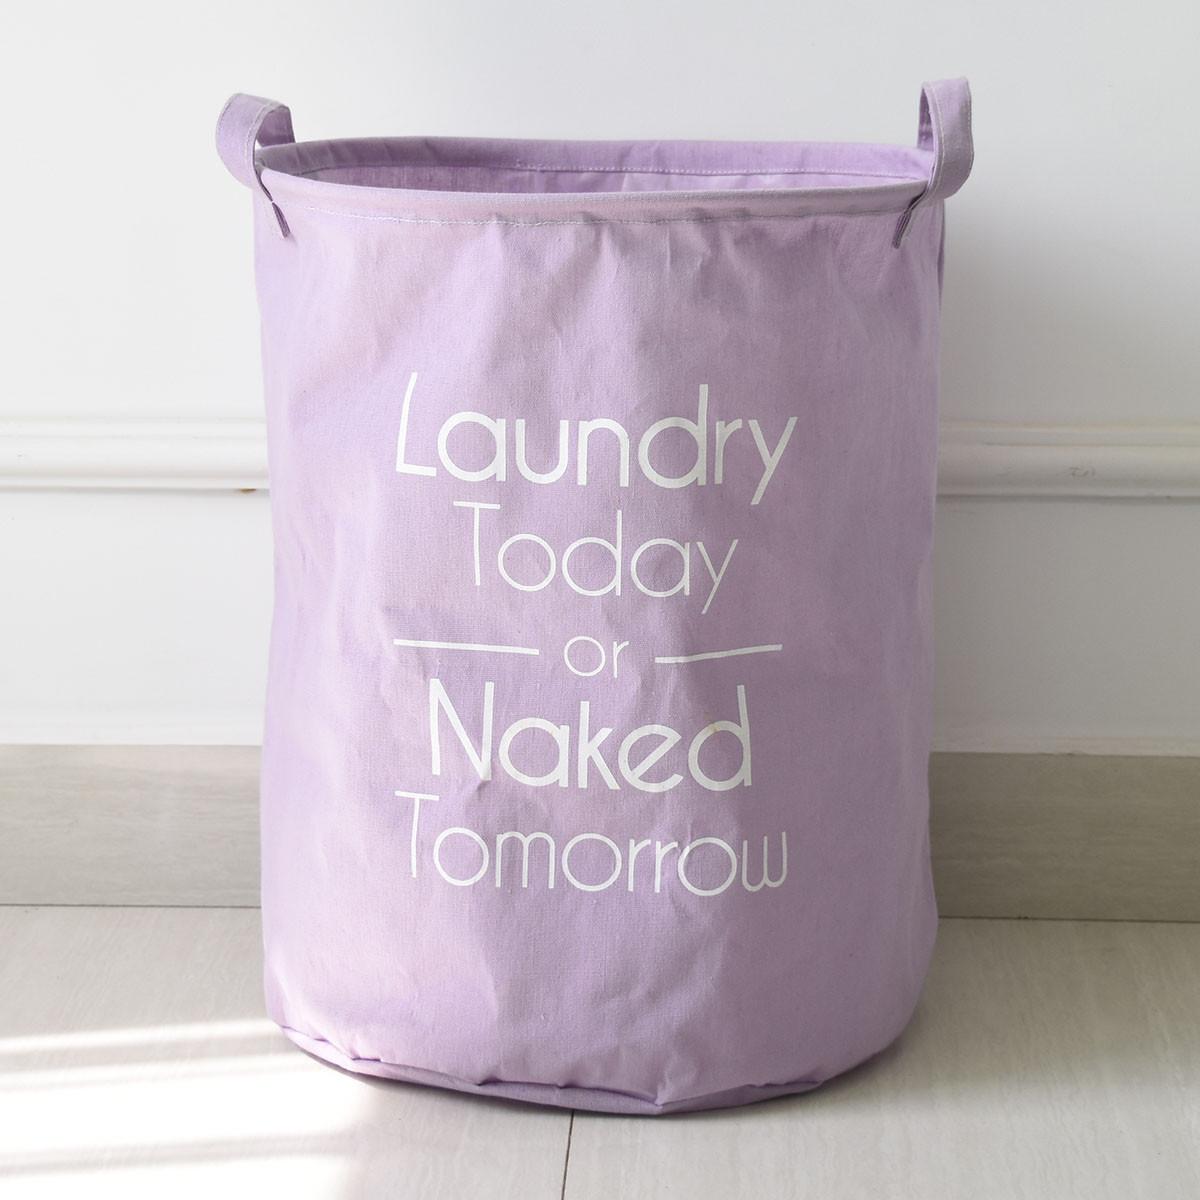 berni Корзина для игрушек Laundry Today lilac, 35х45 см, Berni (44514)